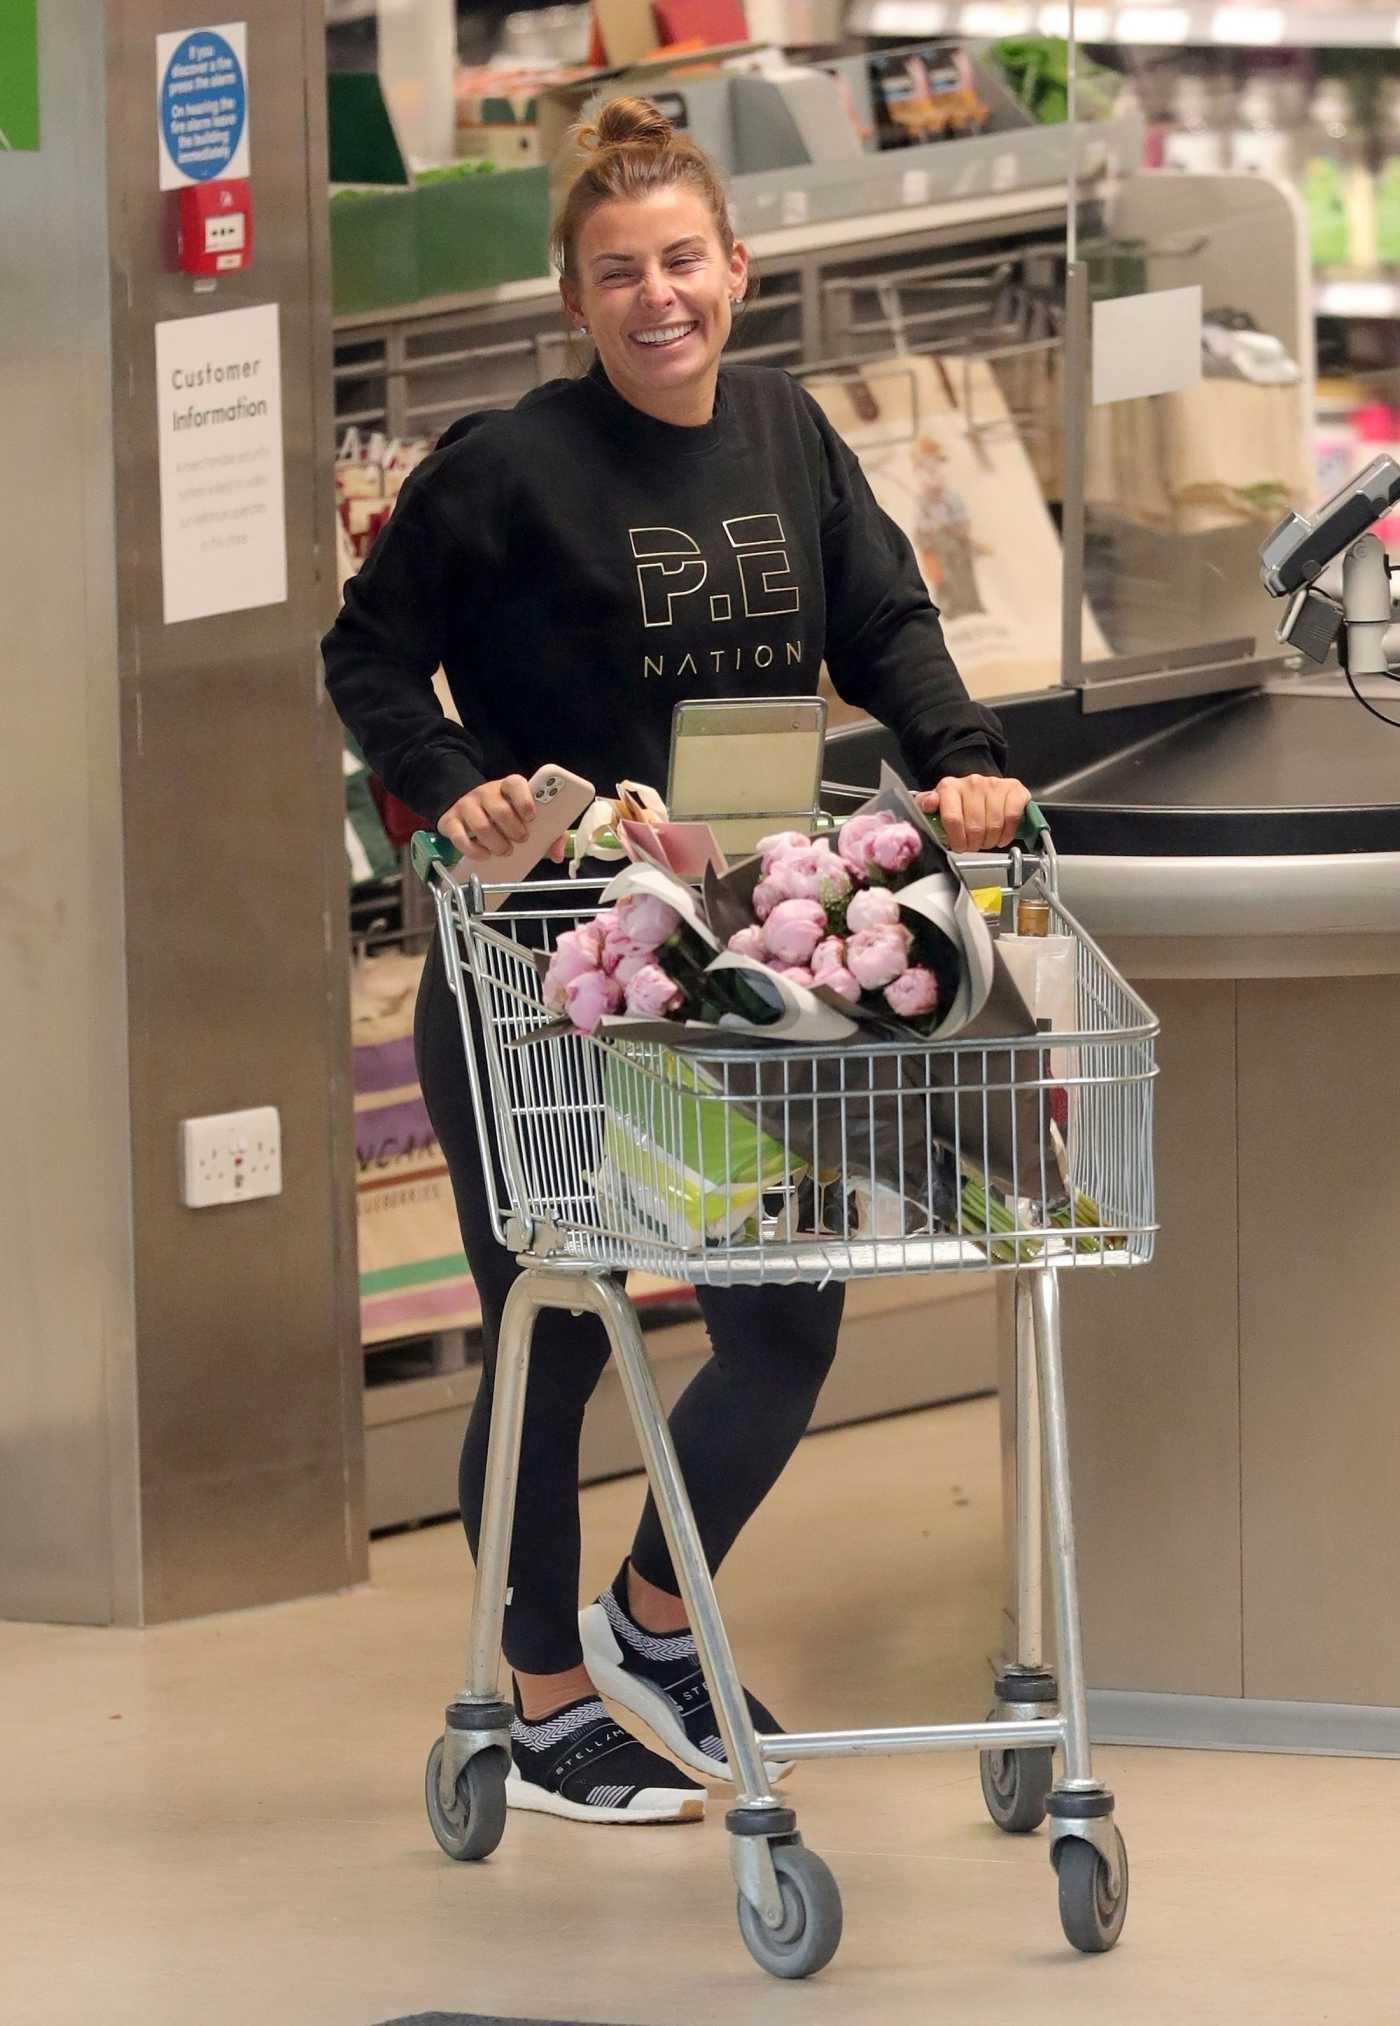 Coleen Rooney in a Black Sweatshirt Shops for Flowers at Waitrose Supermarket in Alderley Edge, Cheshire 06/04/2020